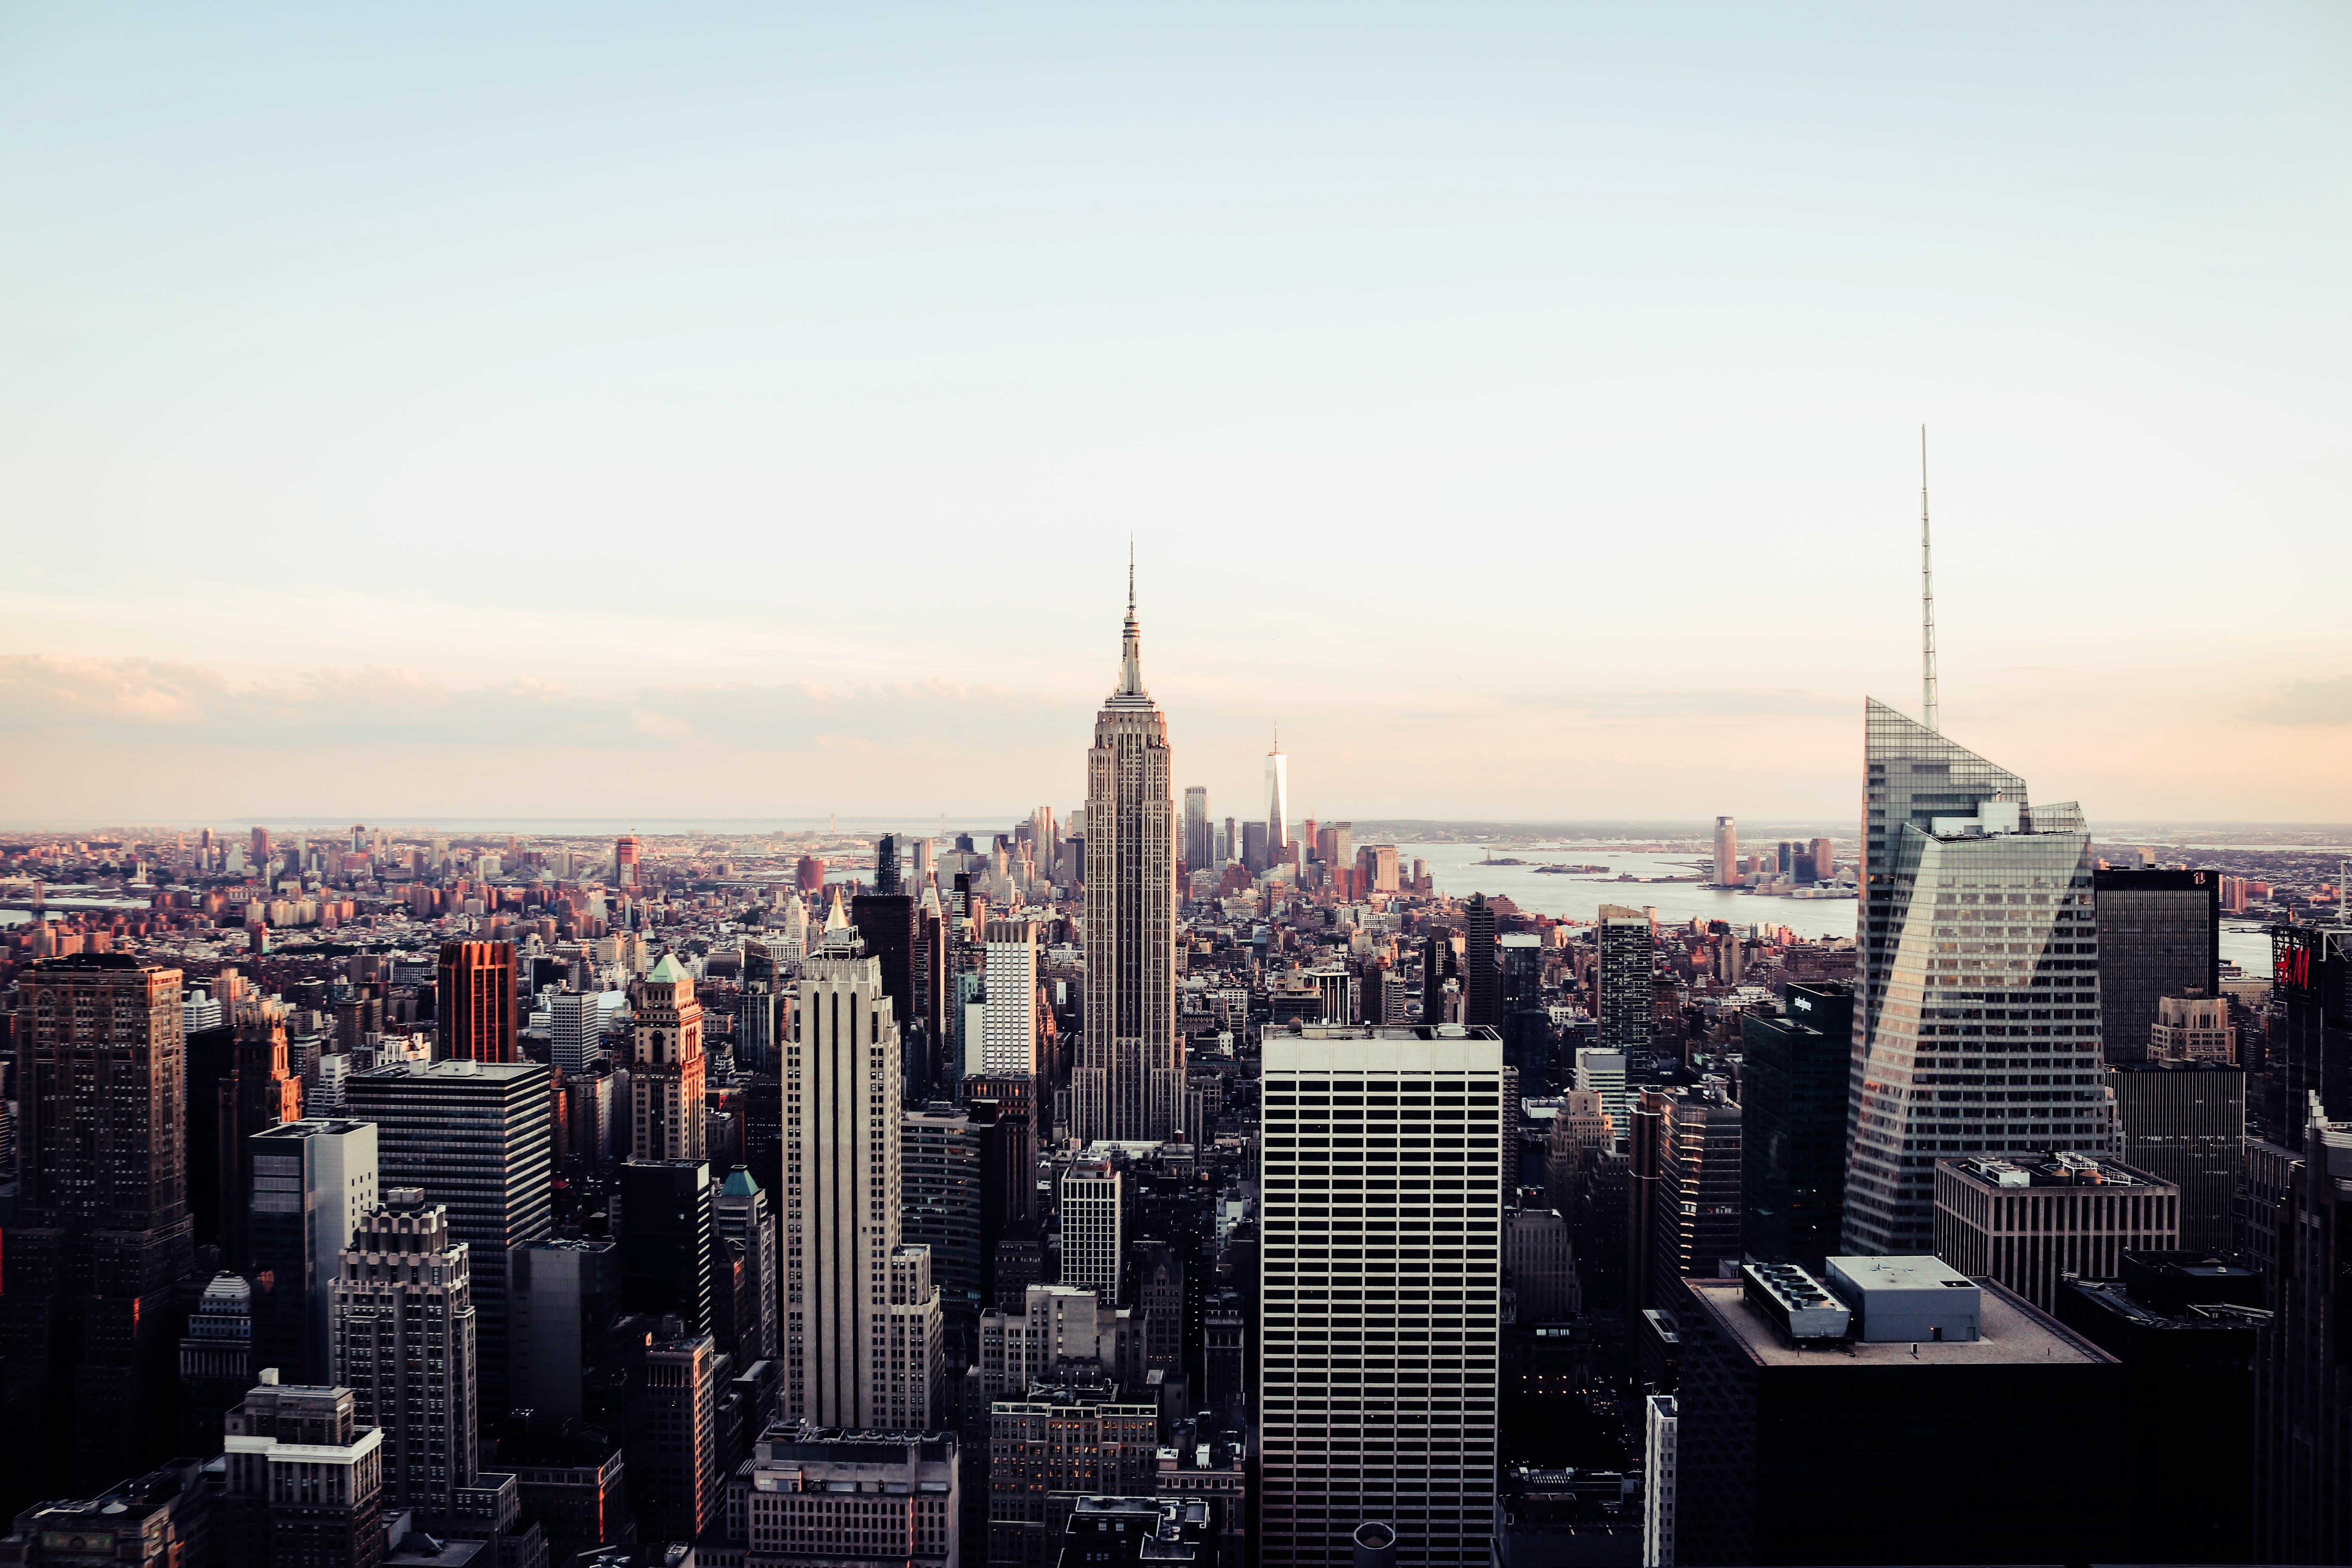 New York Night City HD POSTER